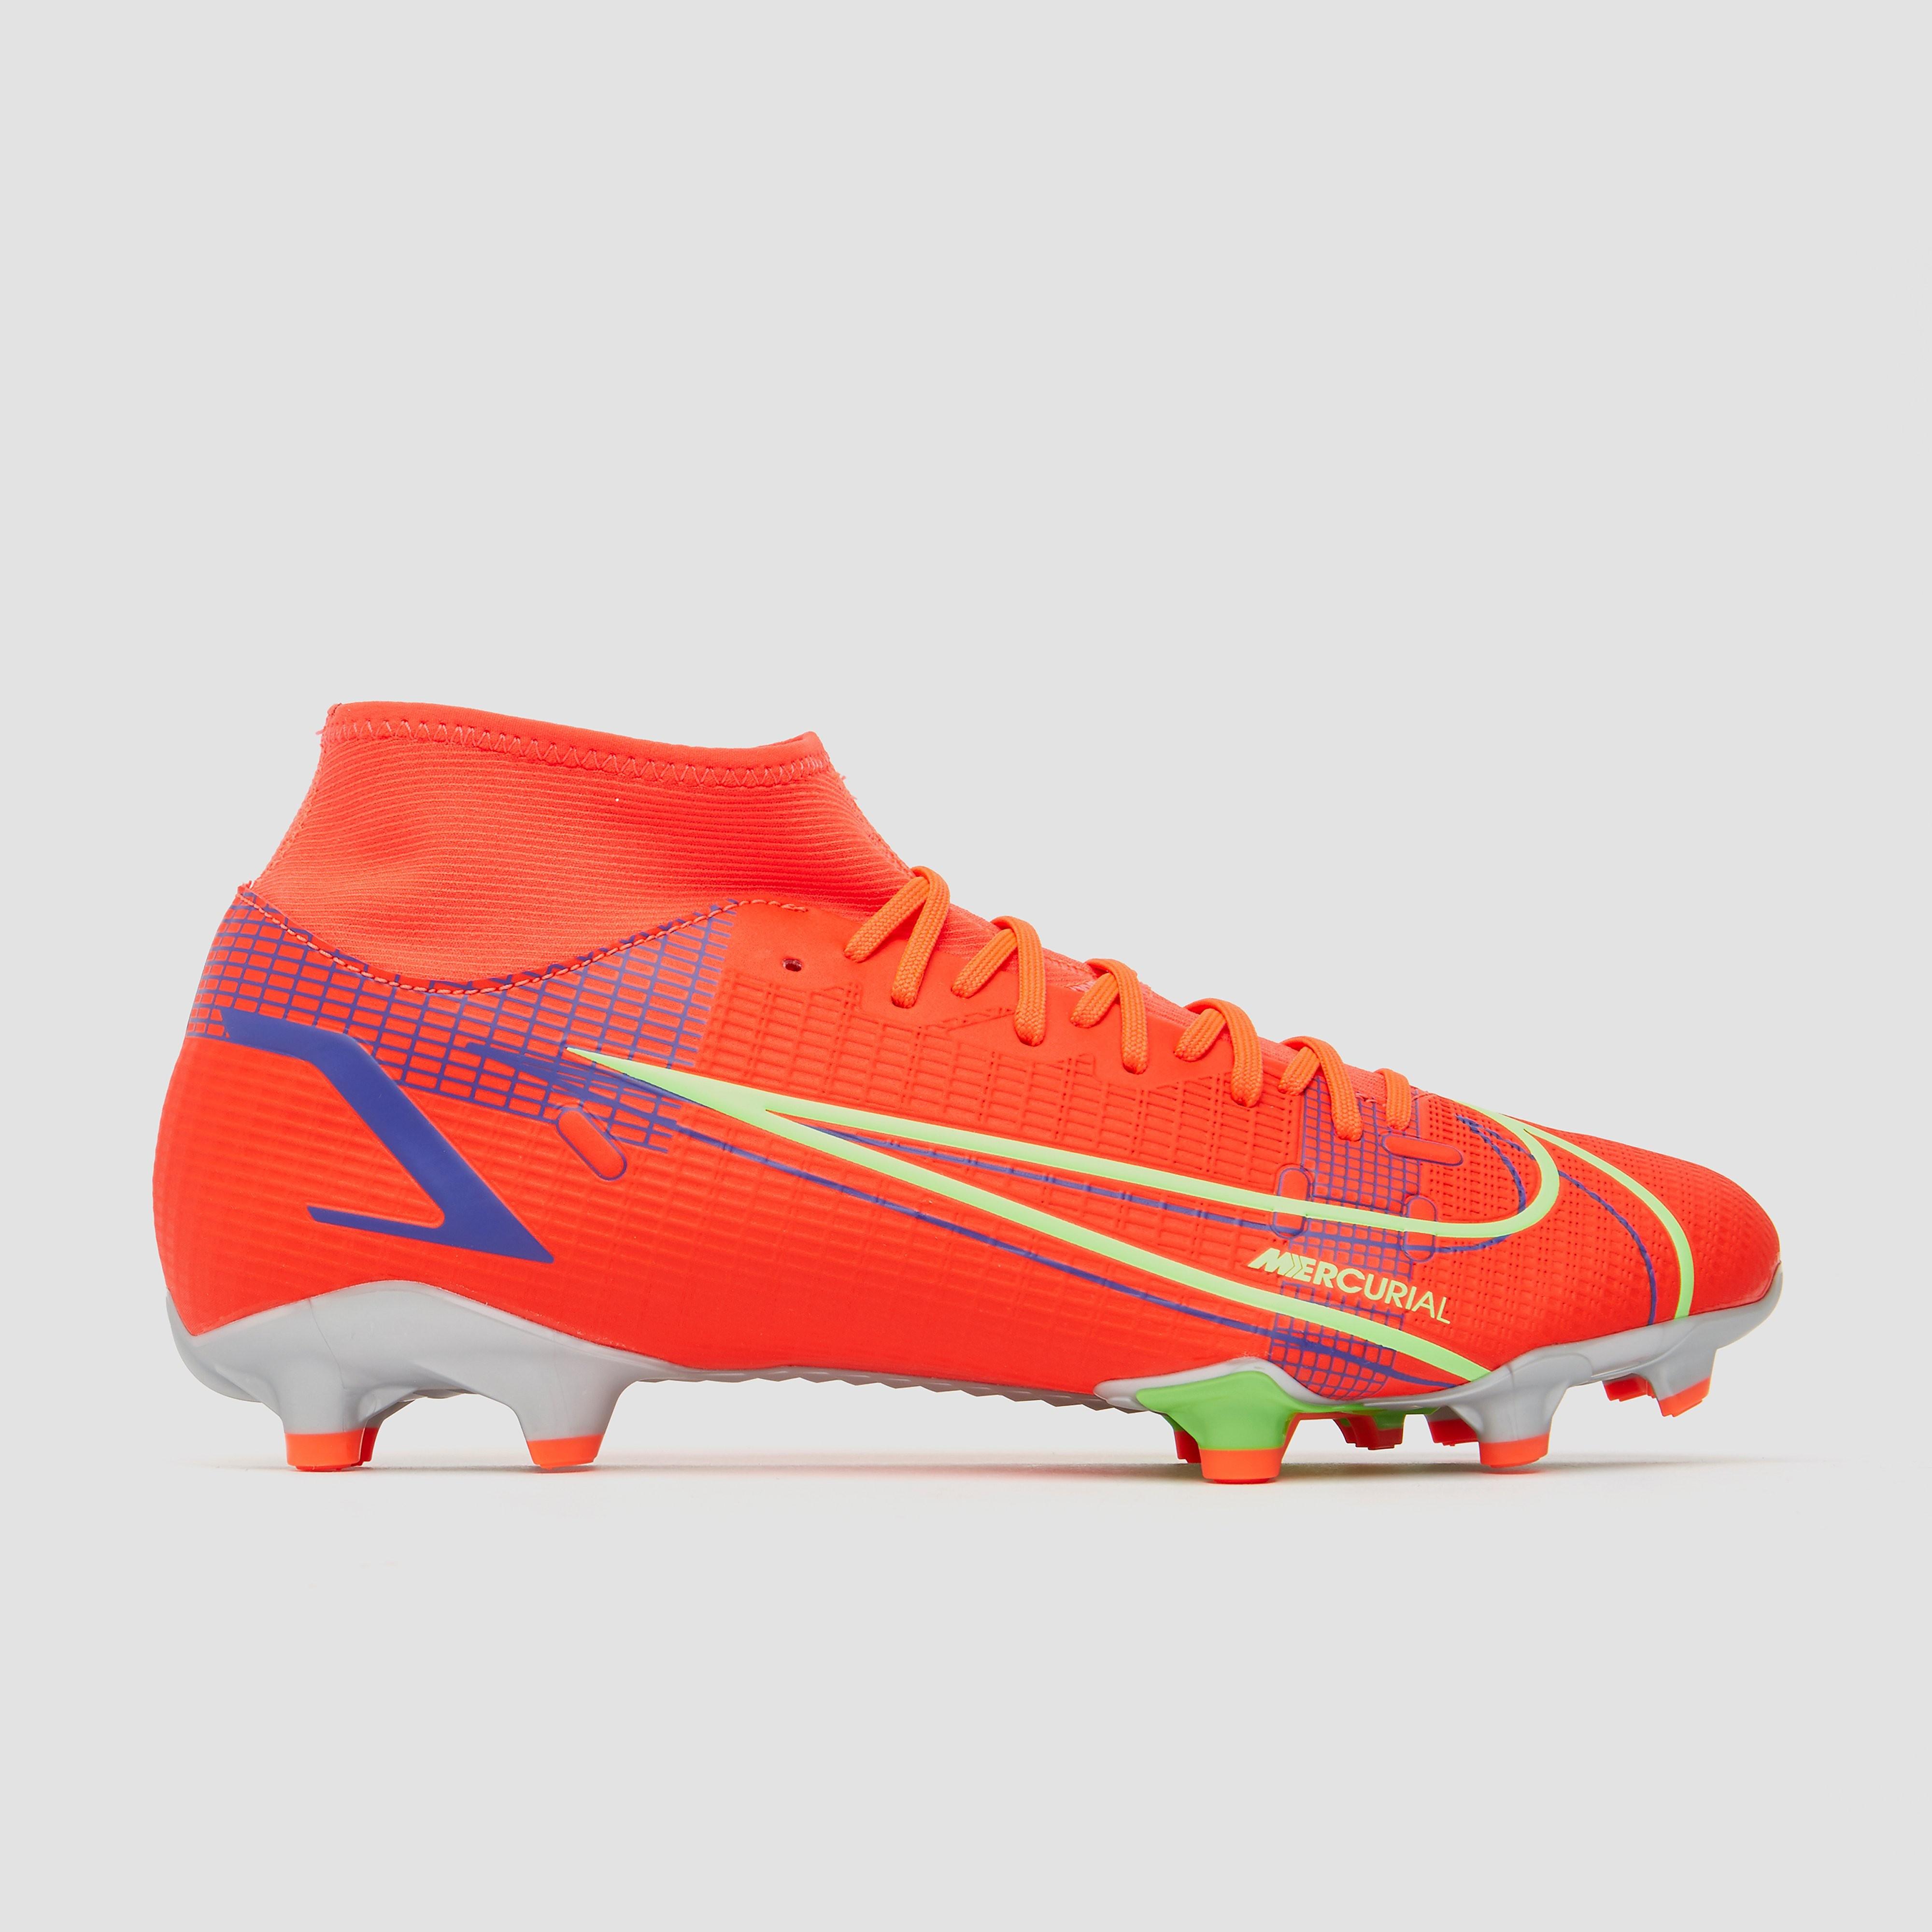 NIKE Mercurial superfly 8 academy df mg voetbalschoenen rood Dames